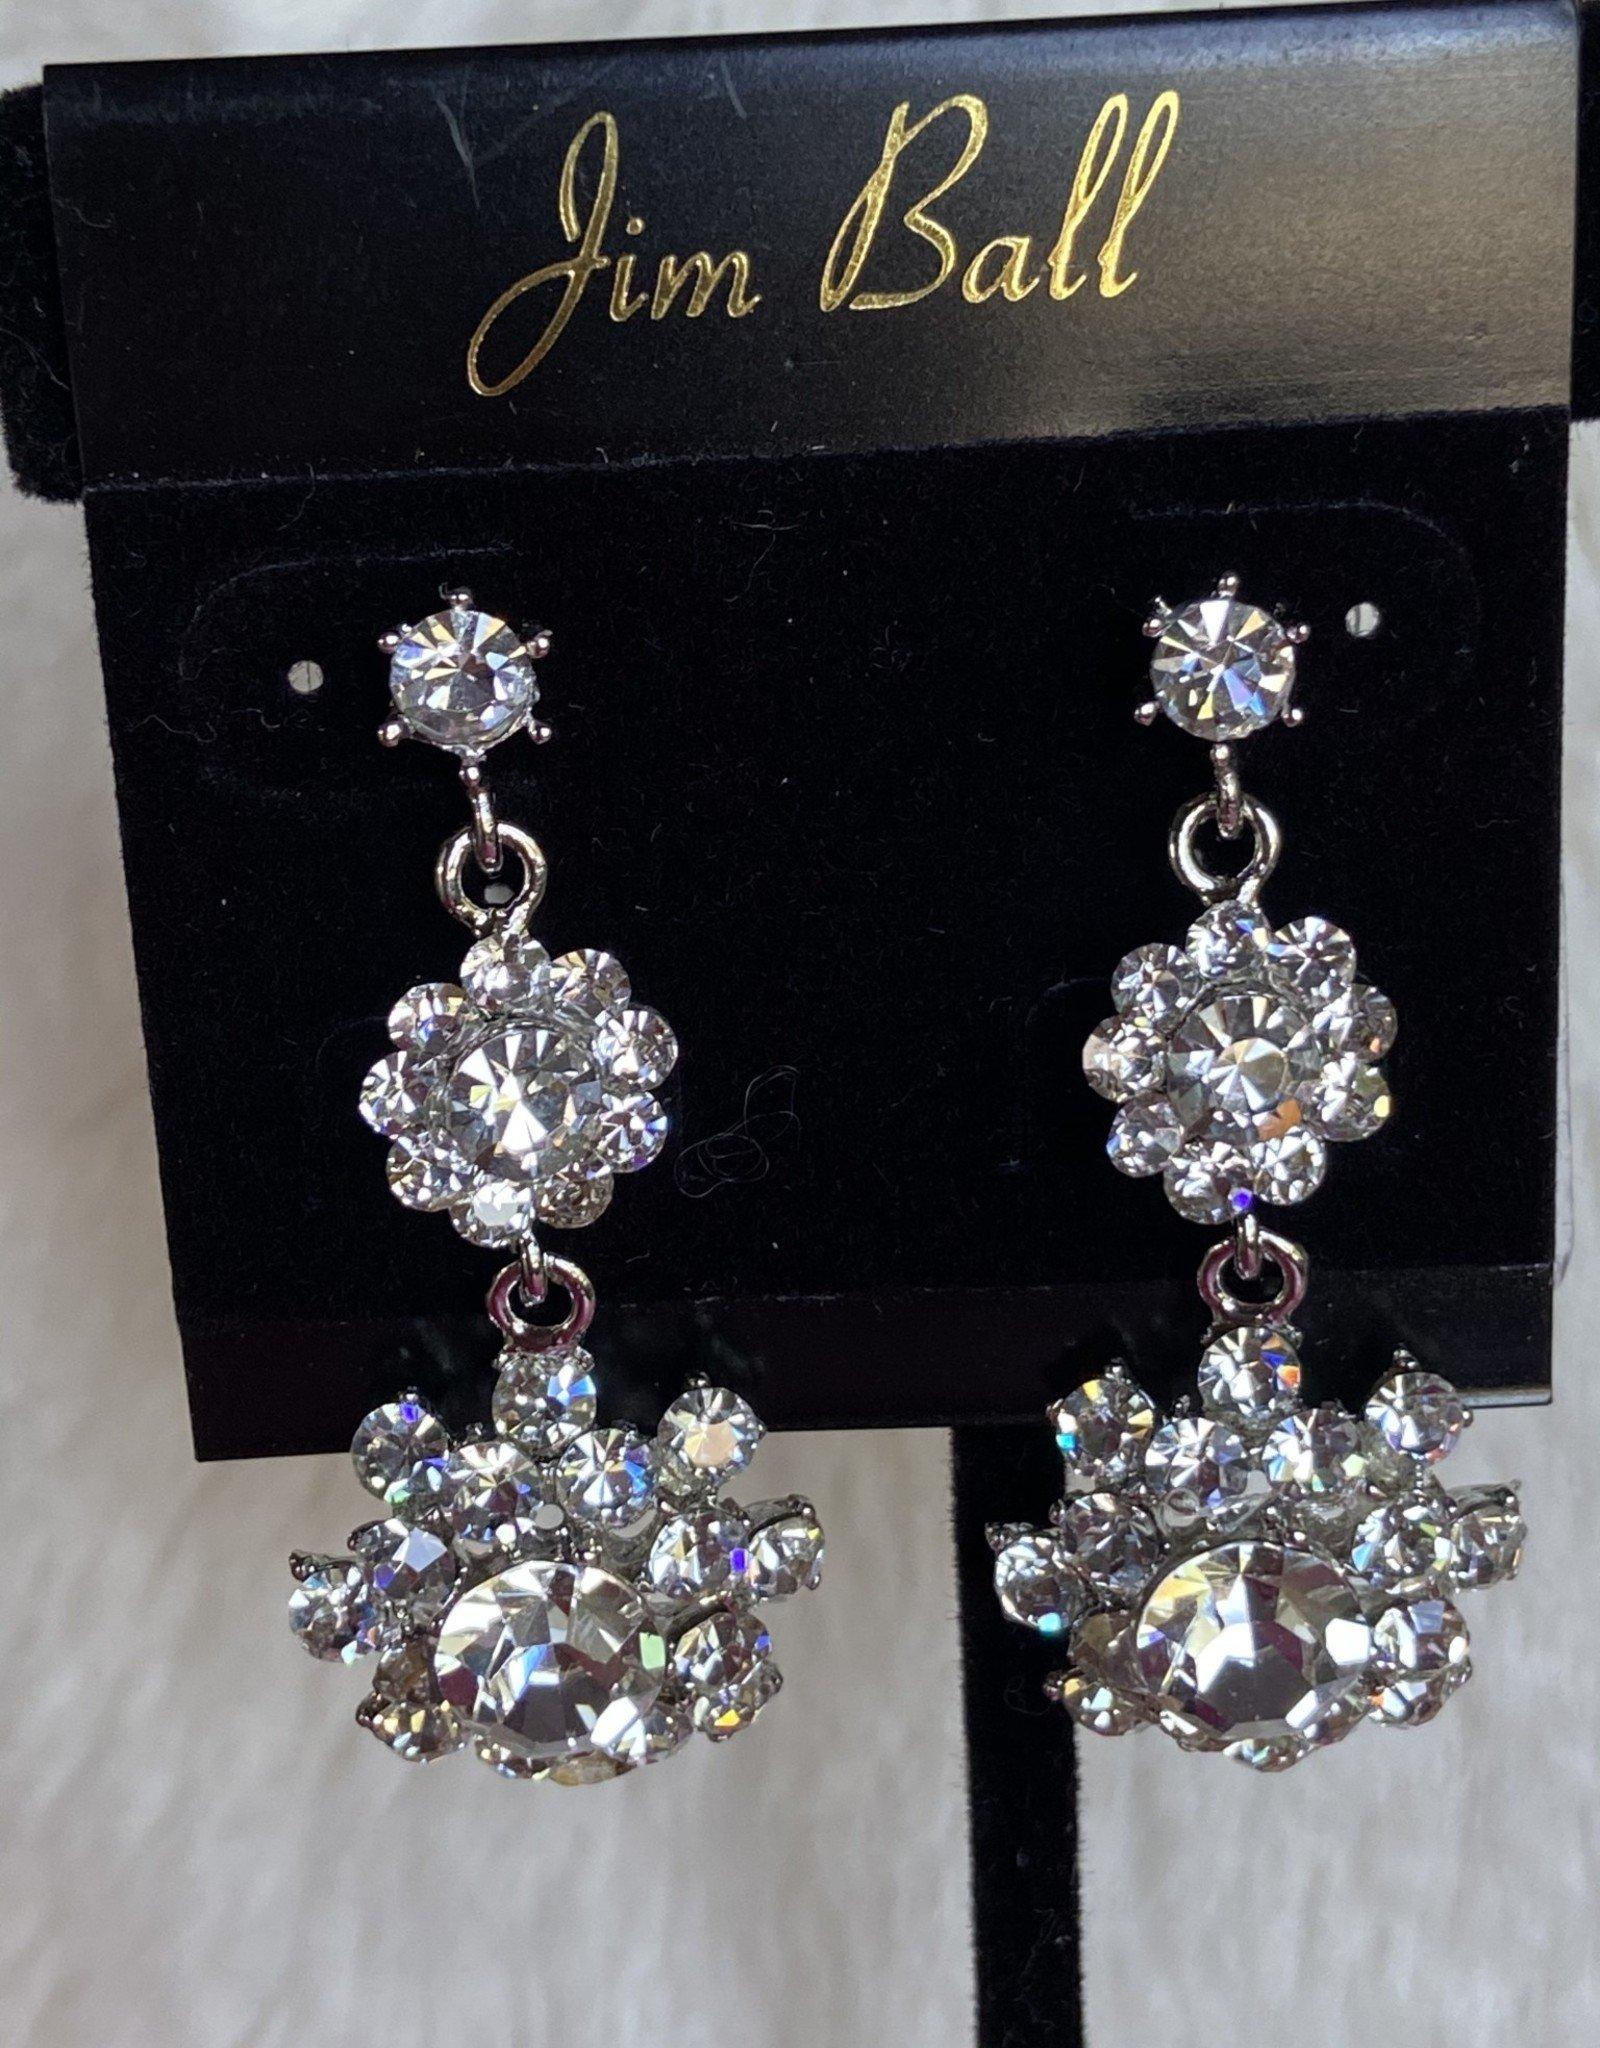 Jim Ball JIM BALL CLEAR/SILVER PV25713055